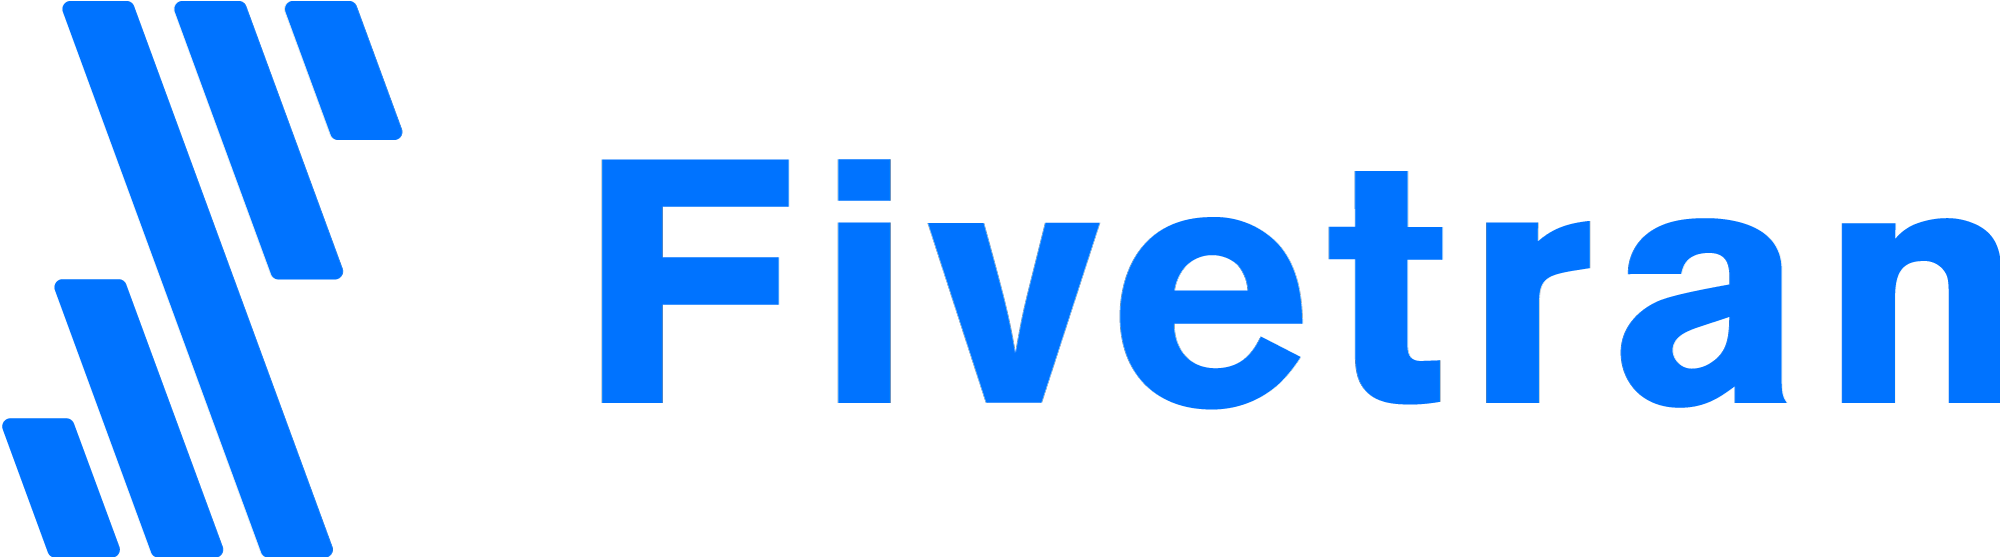 fivetran-logo-web